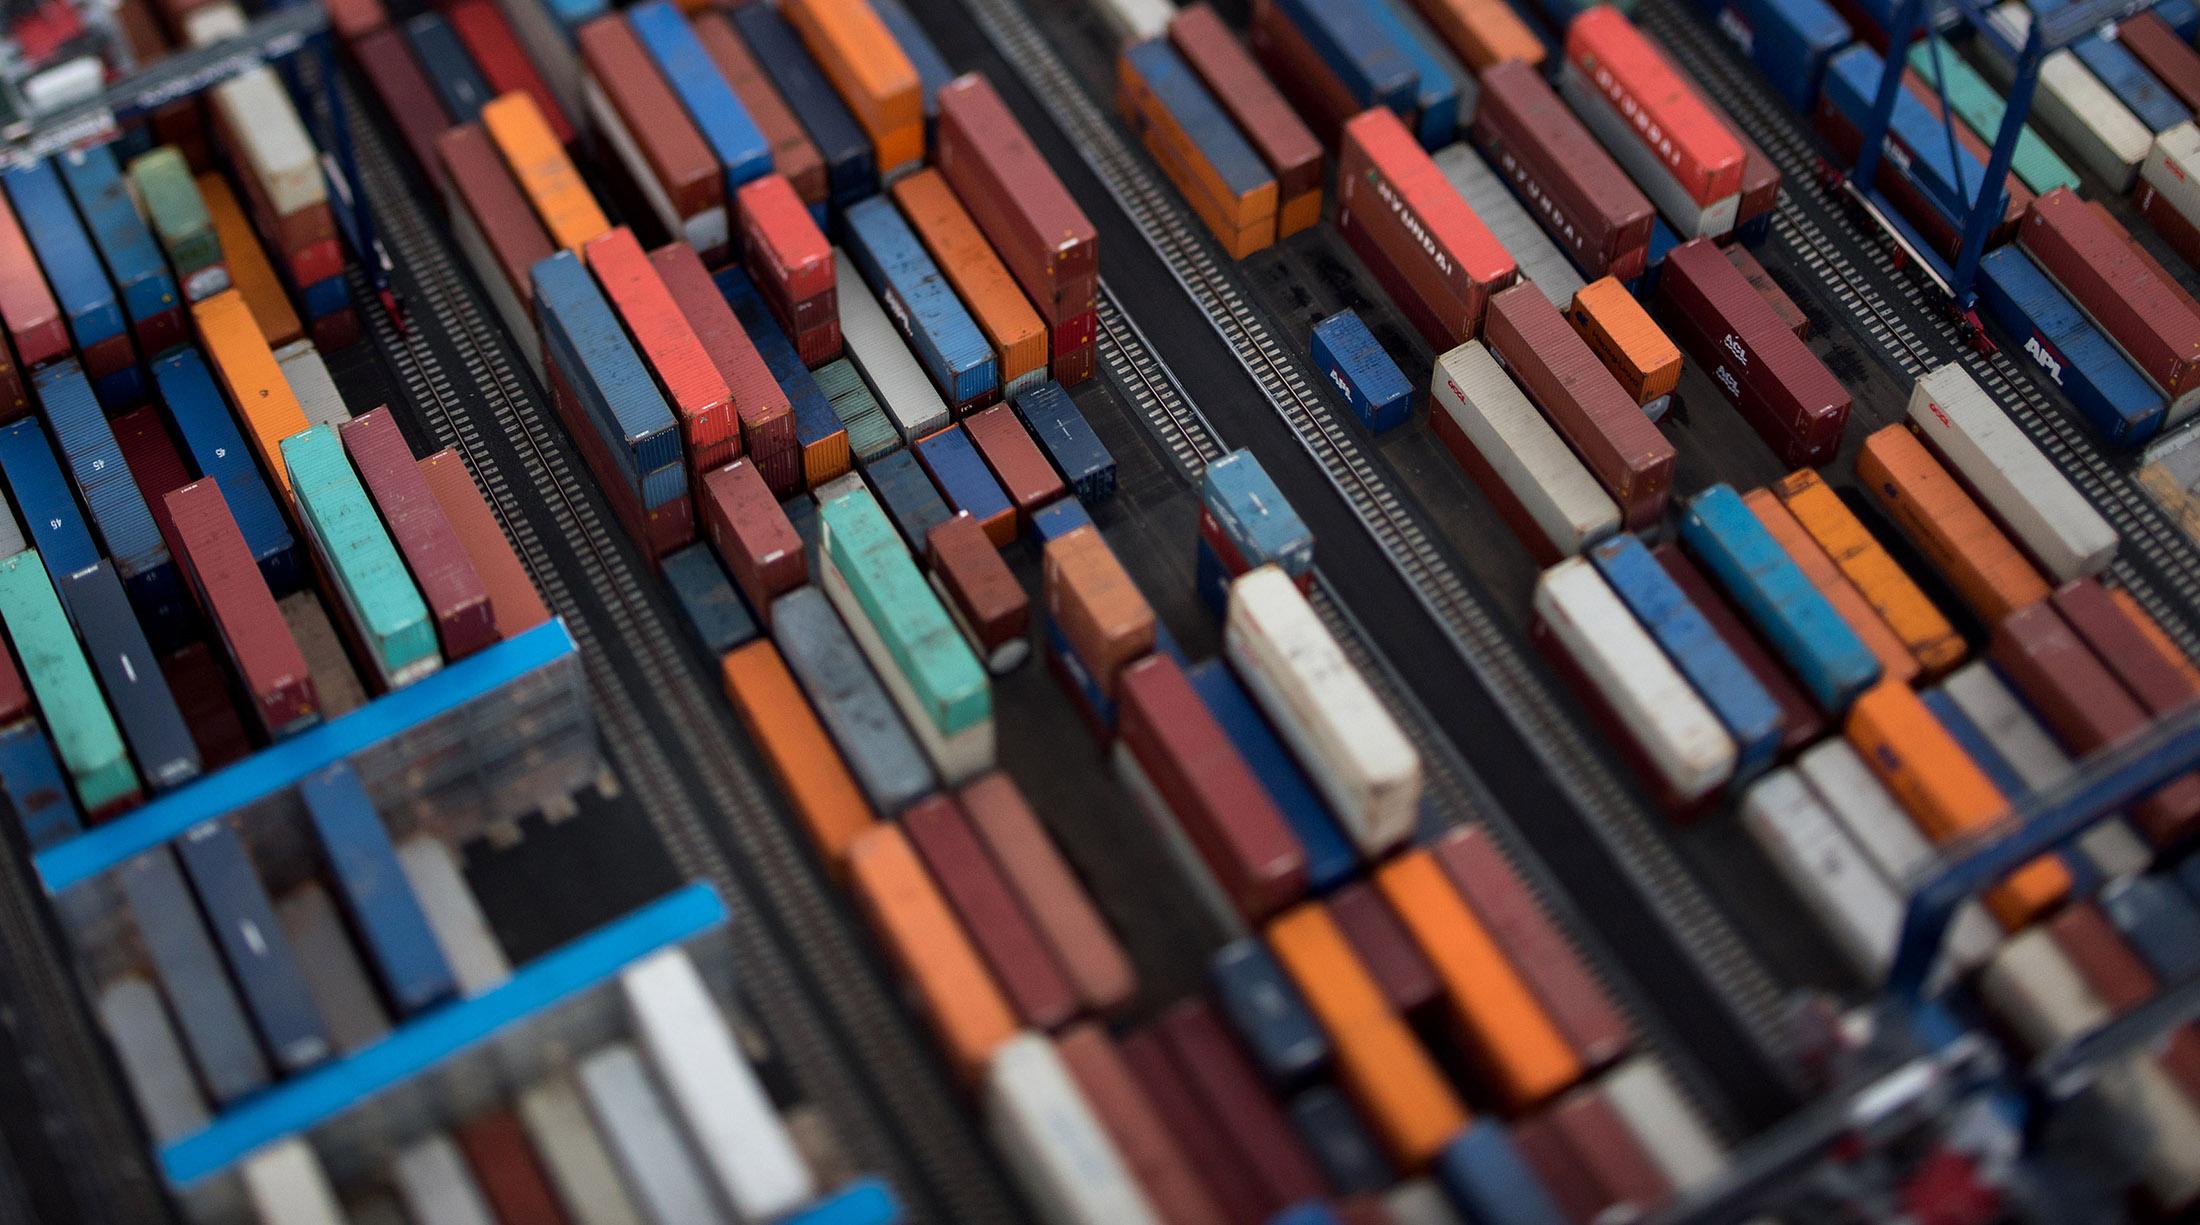 U.S. Will Reclaim Global Supply Chain, Trump Trade Aide Says